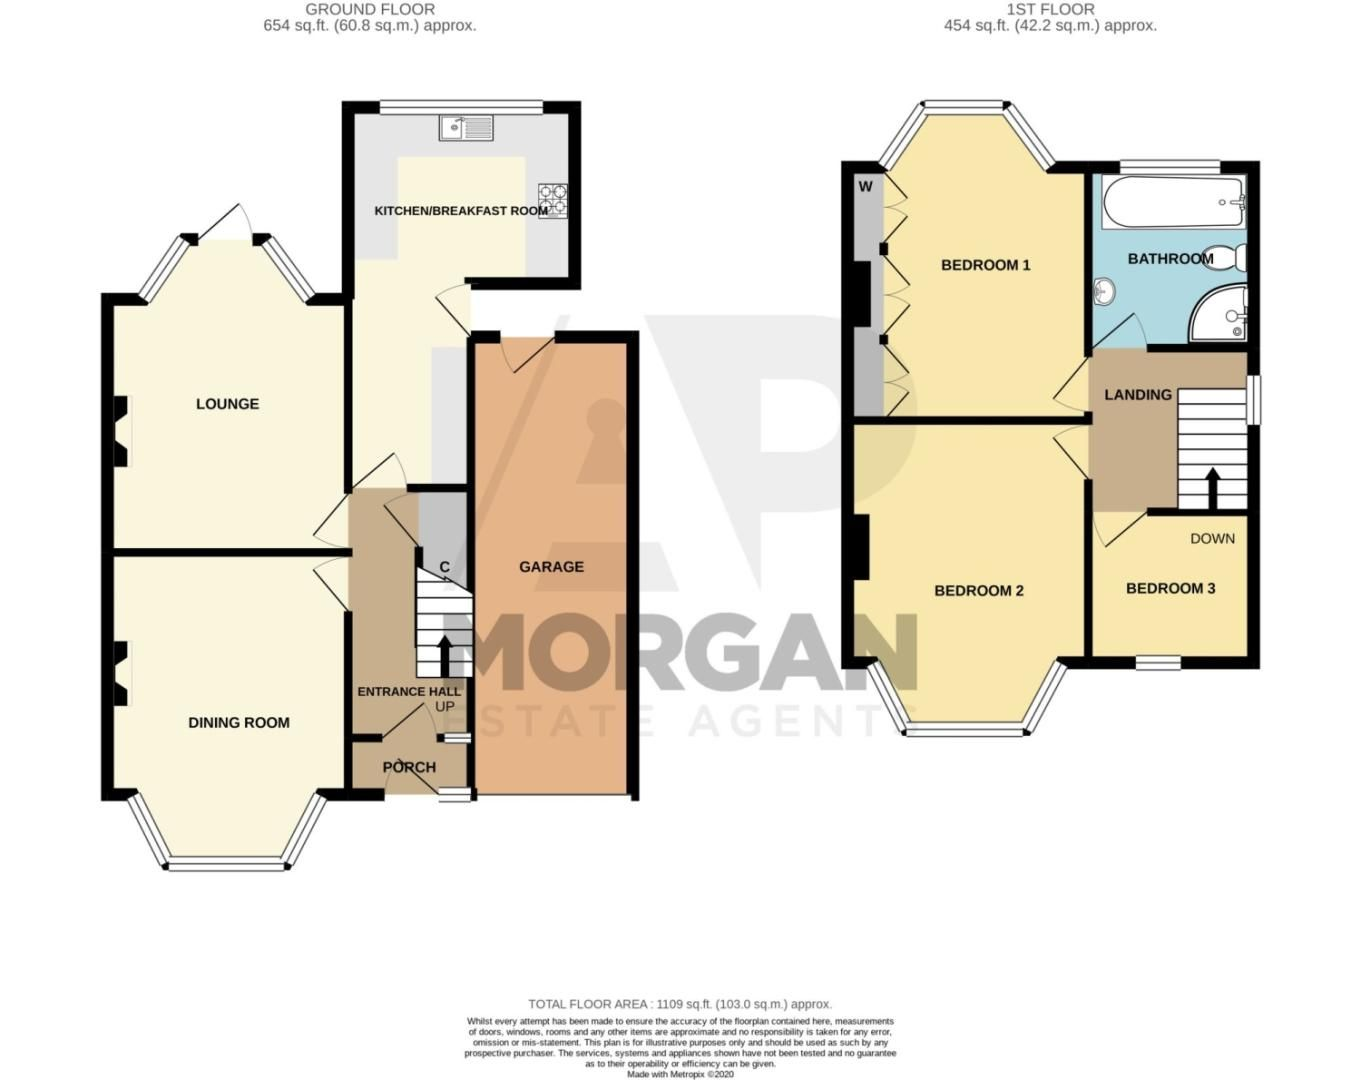 3 bed semi-detached for sale in Howley Grange Road, Halesowen - Property Floorplan